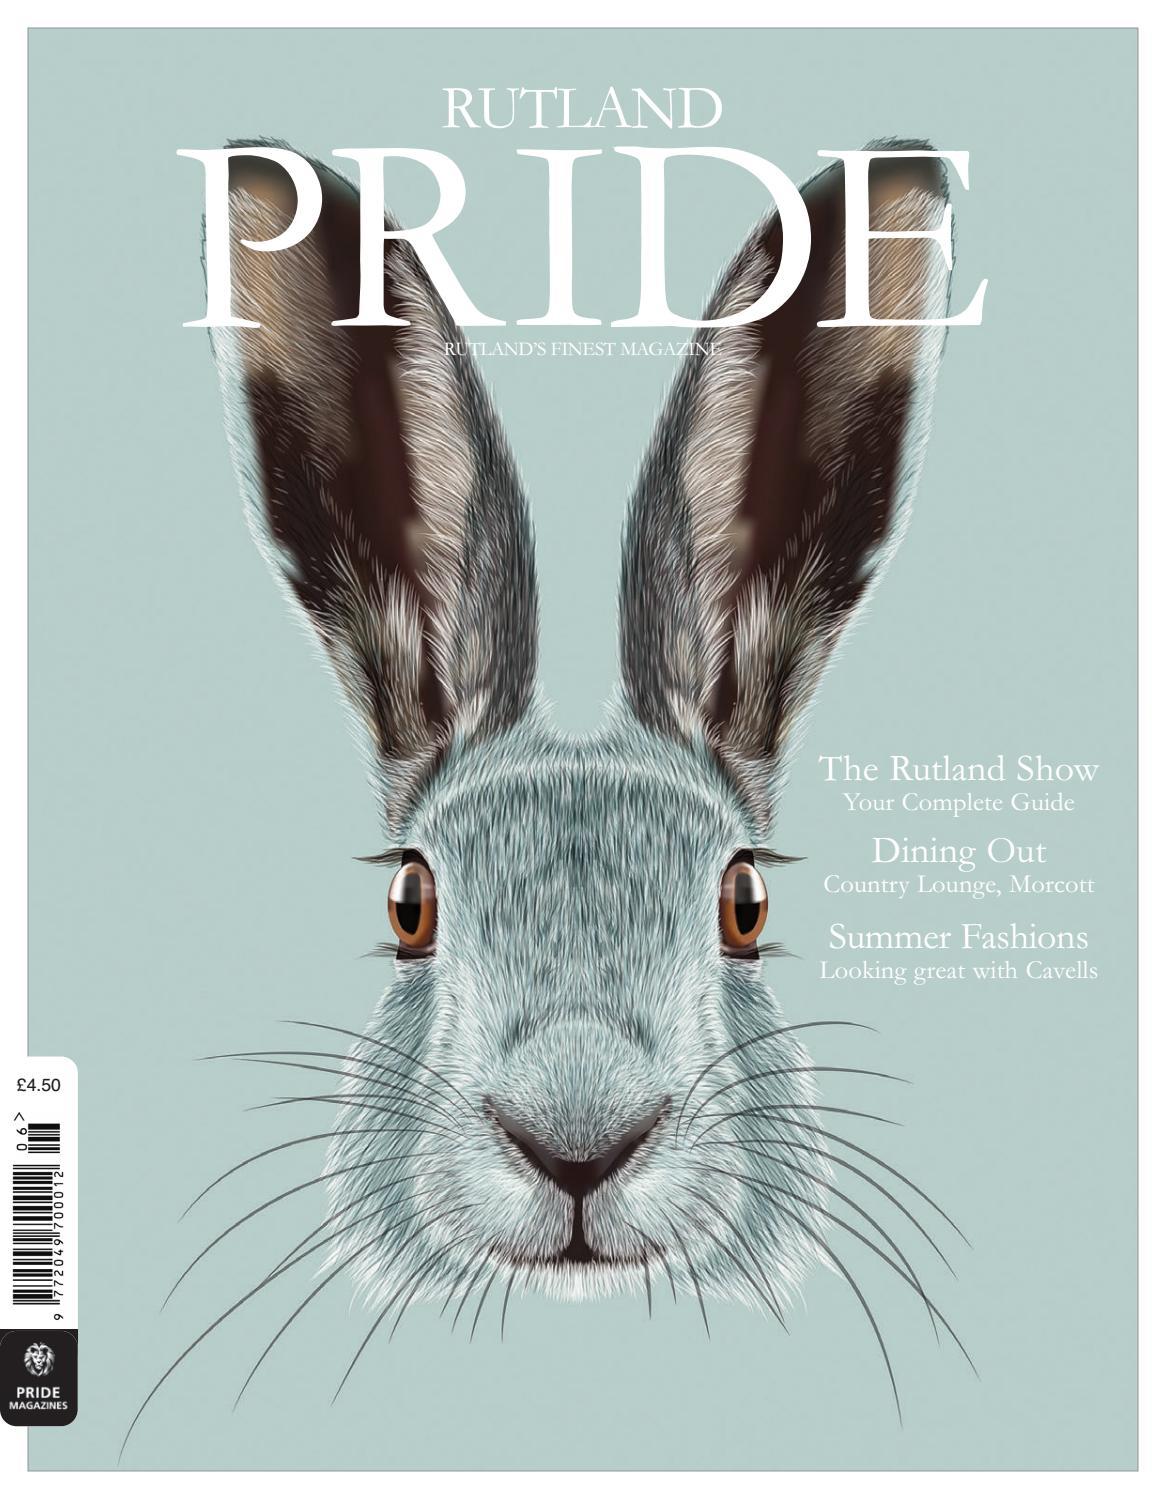 Rutland Pride June 2017 by Pride Magazines Ltd - issuu